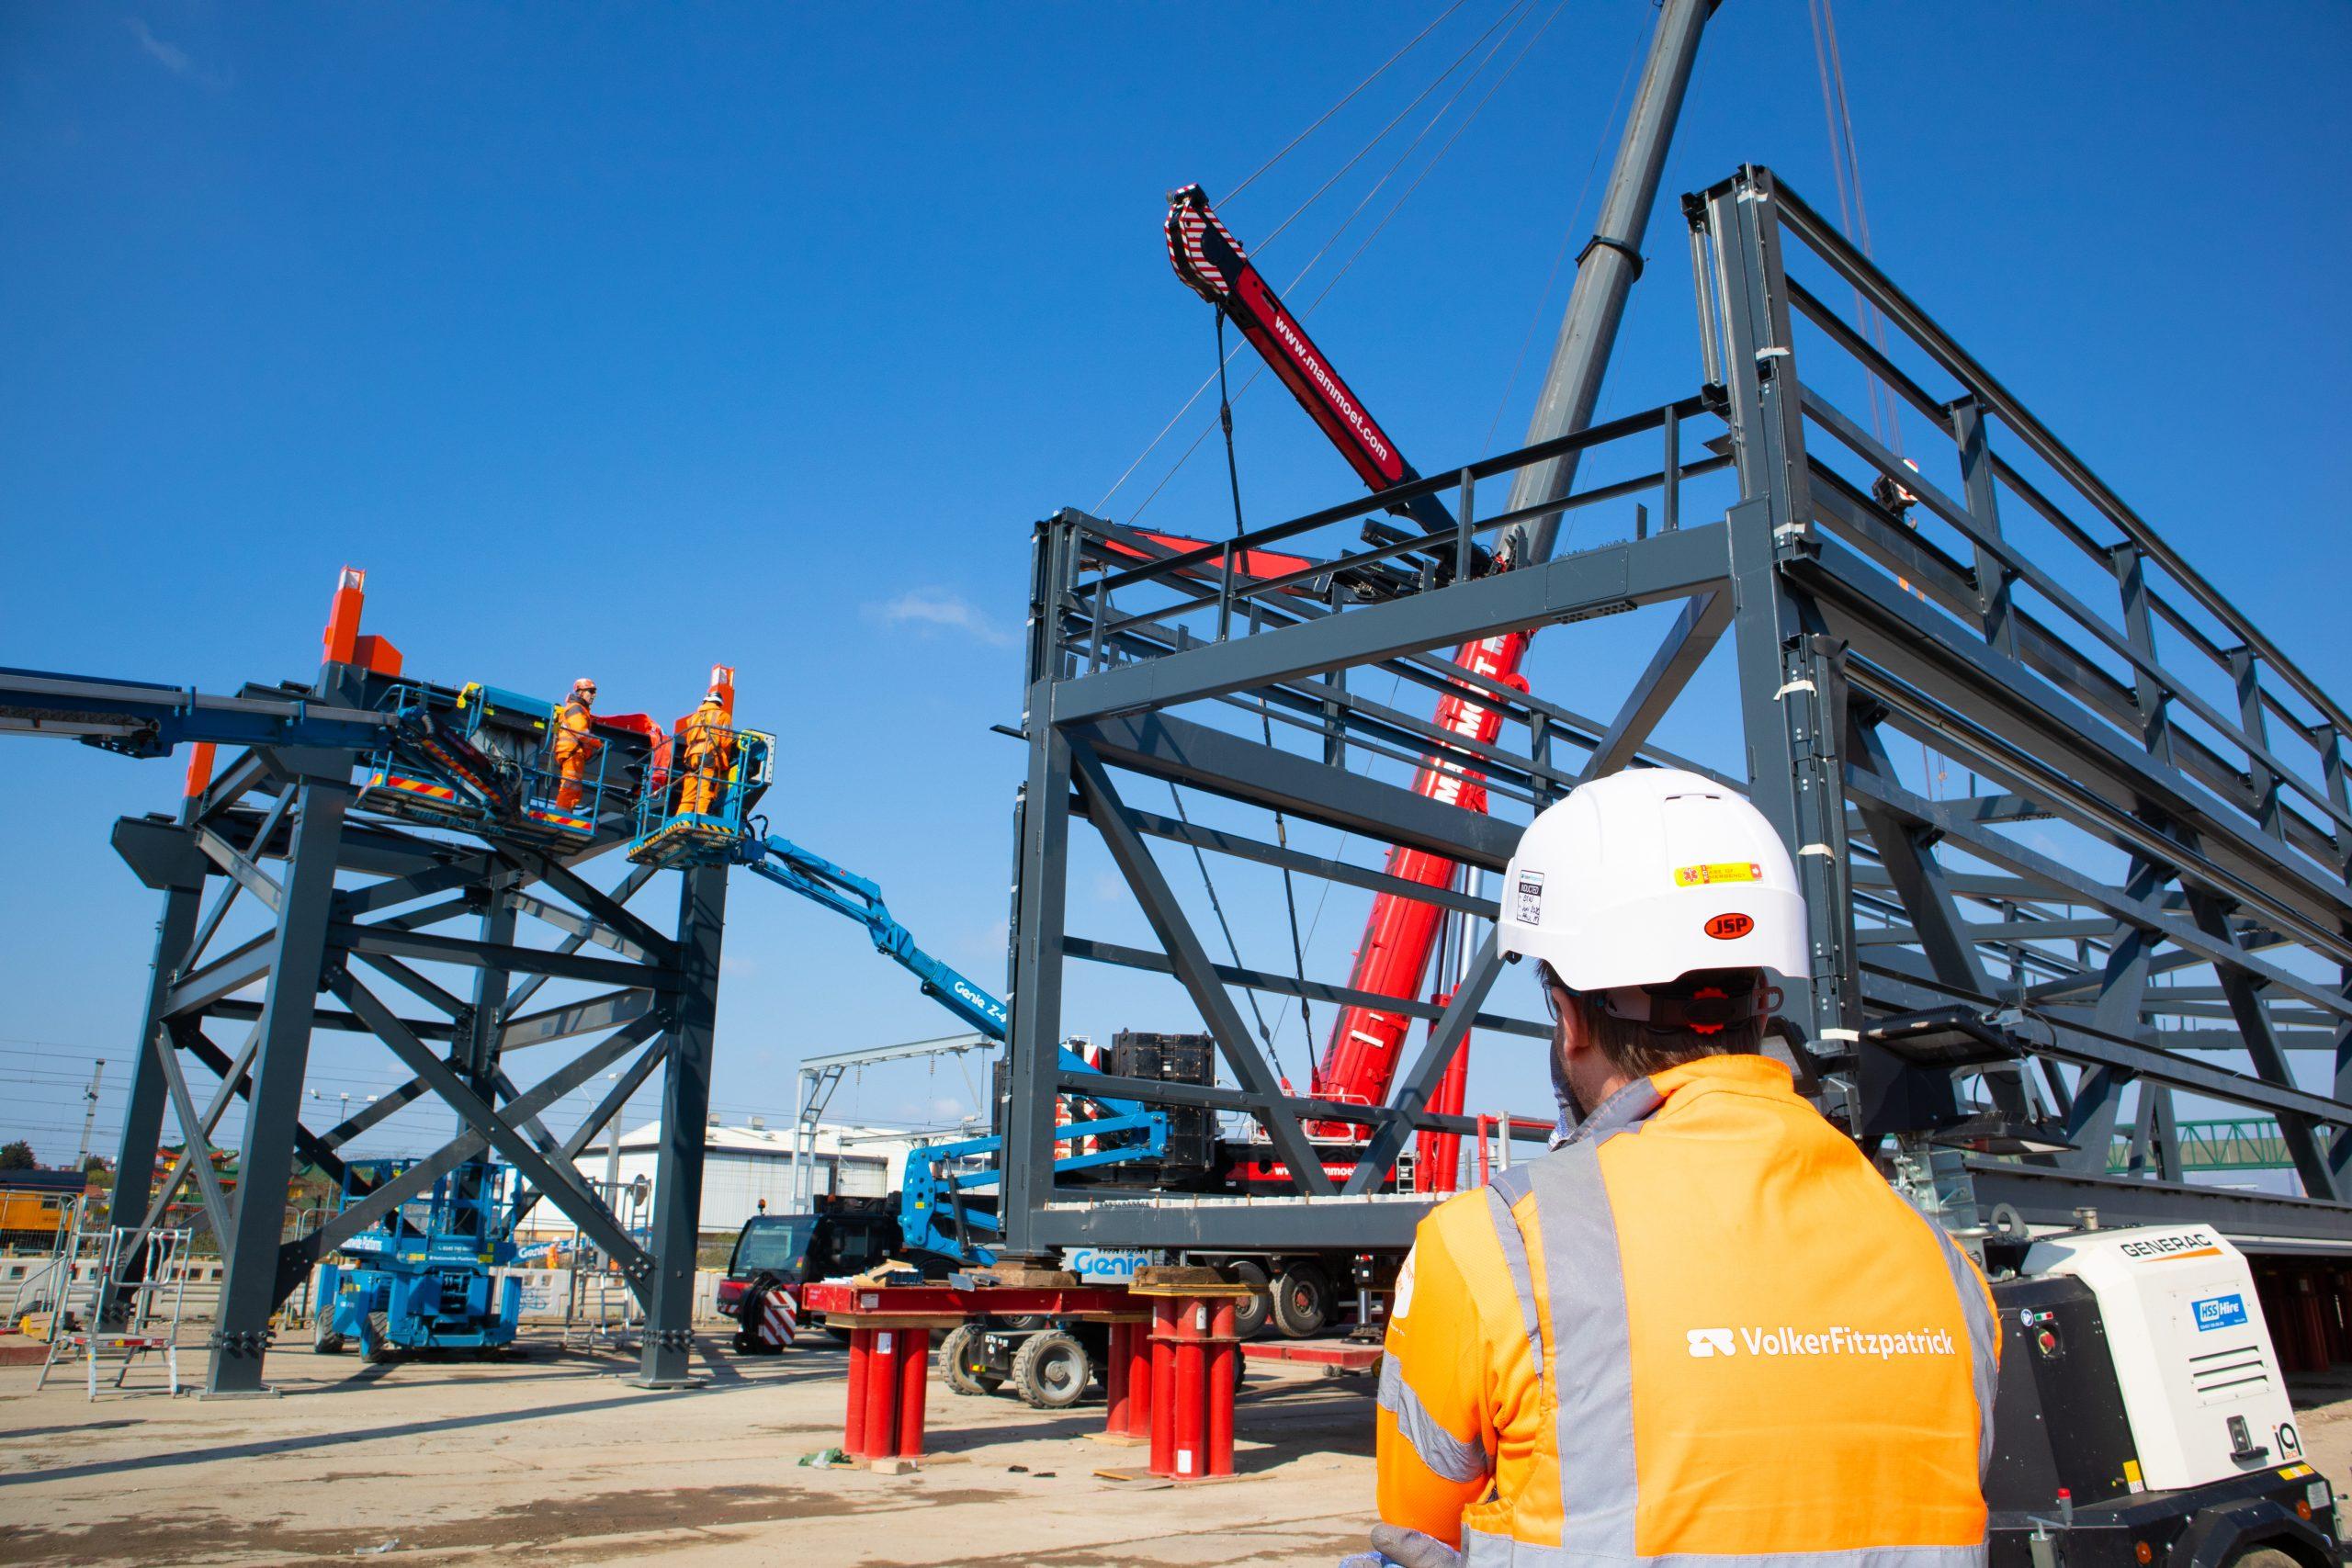 The Eastern Overbridge installation